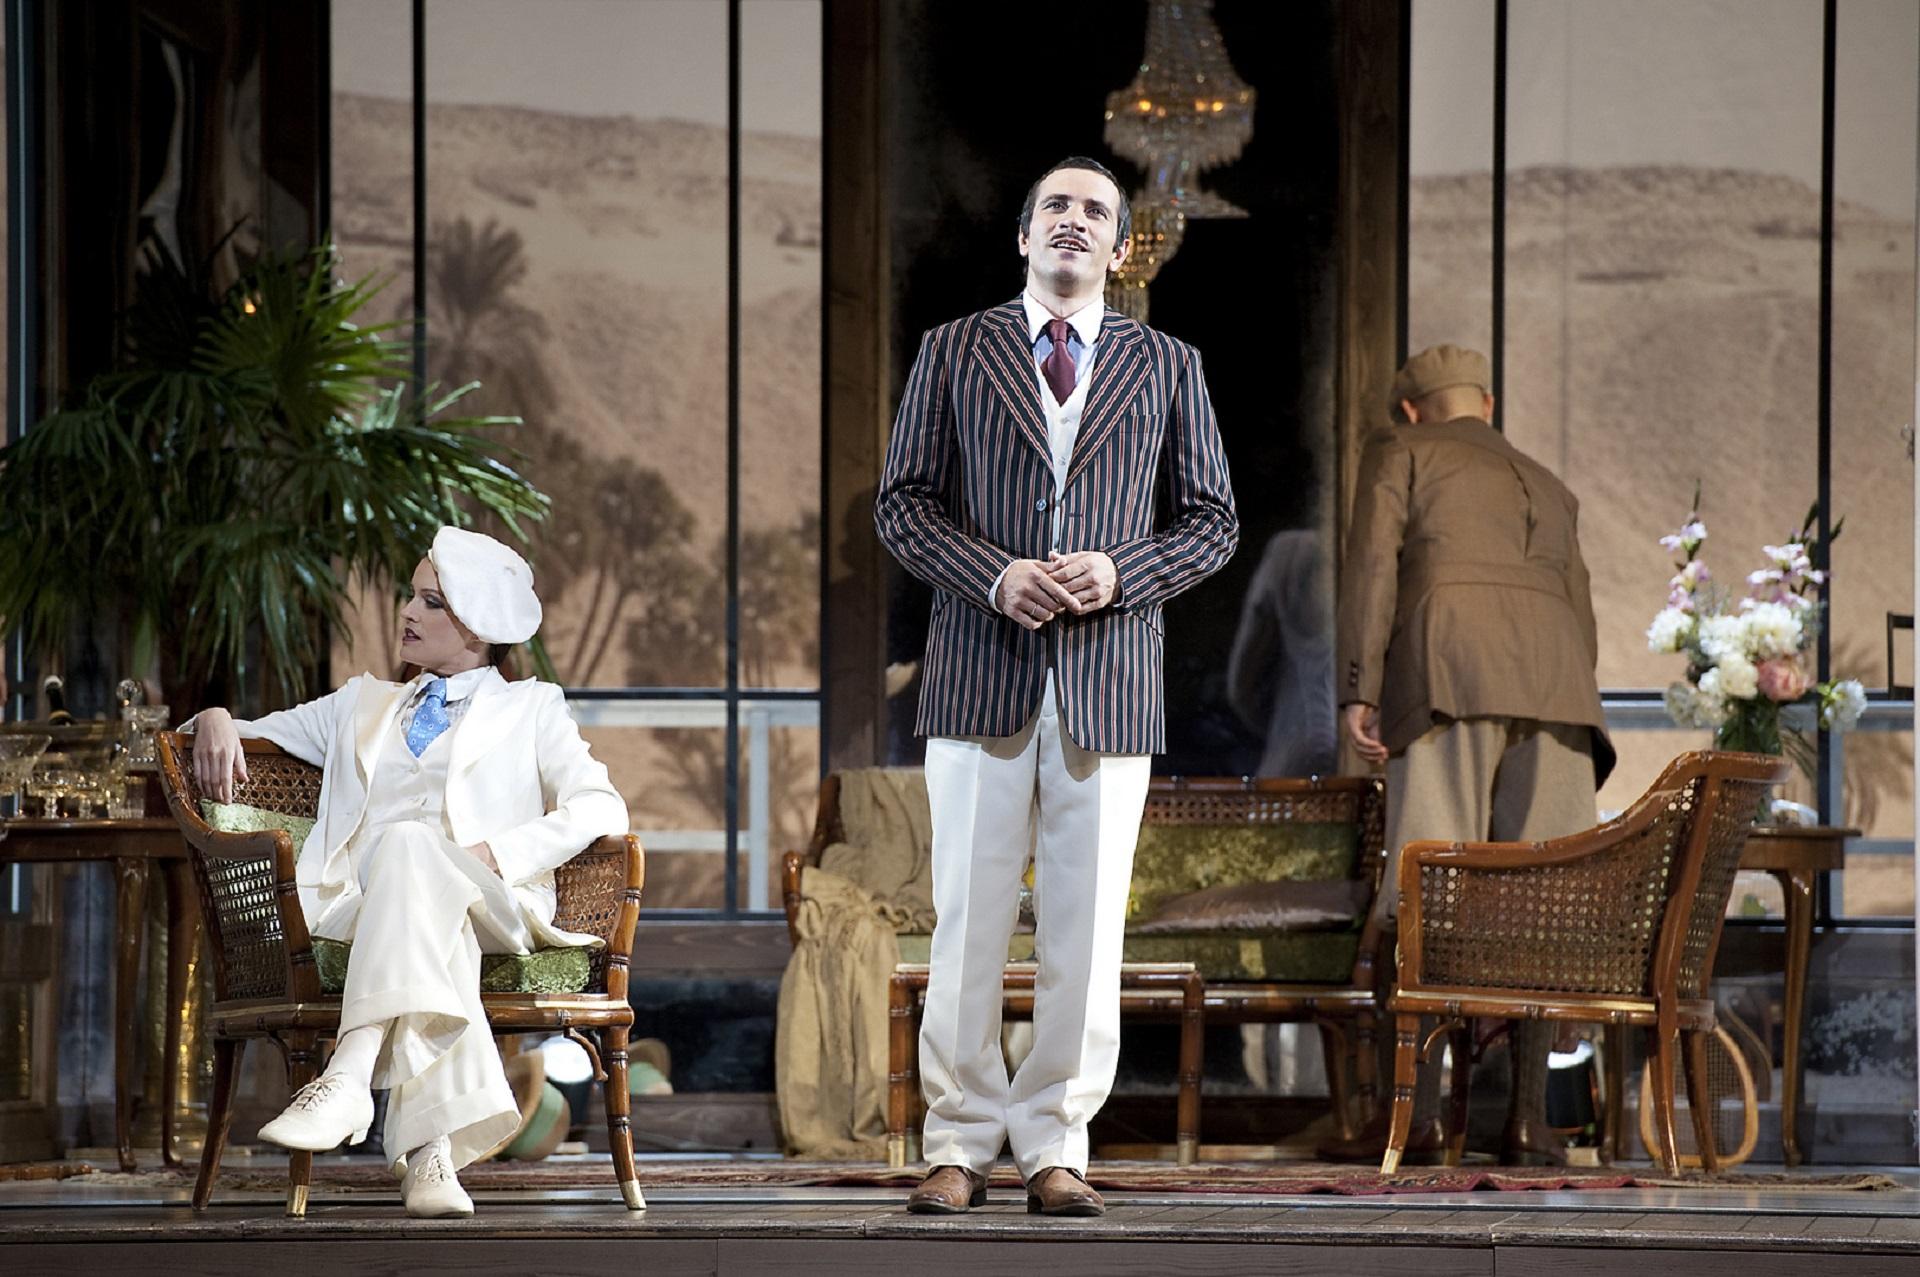 Pilger-Von-Mekka-Opera-Stage-Director-Jacopo-Spirei-4